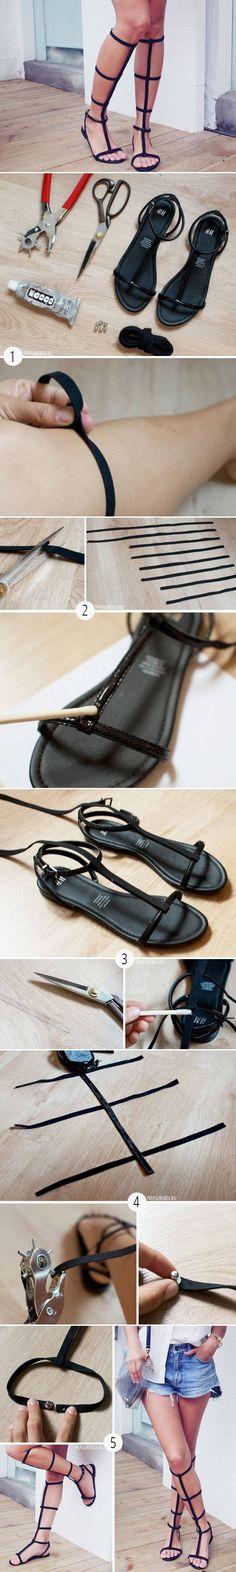 Gladiator Sandals: Leather, Snaps, Glue